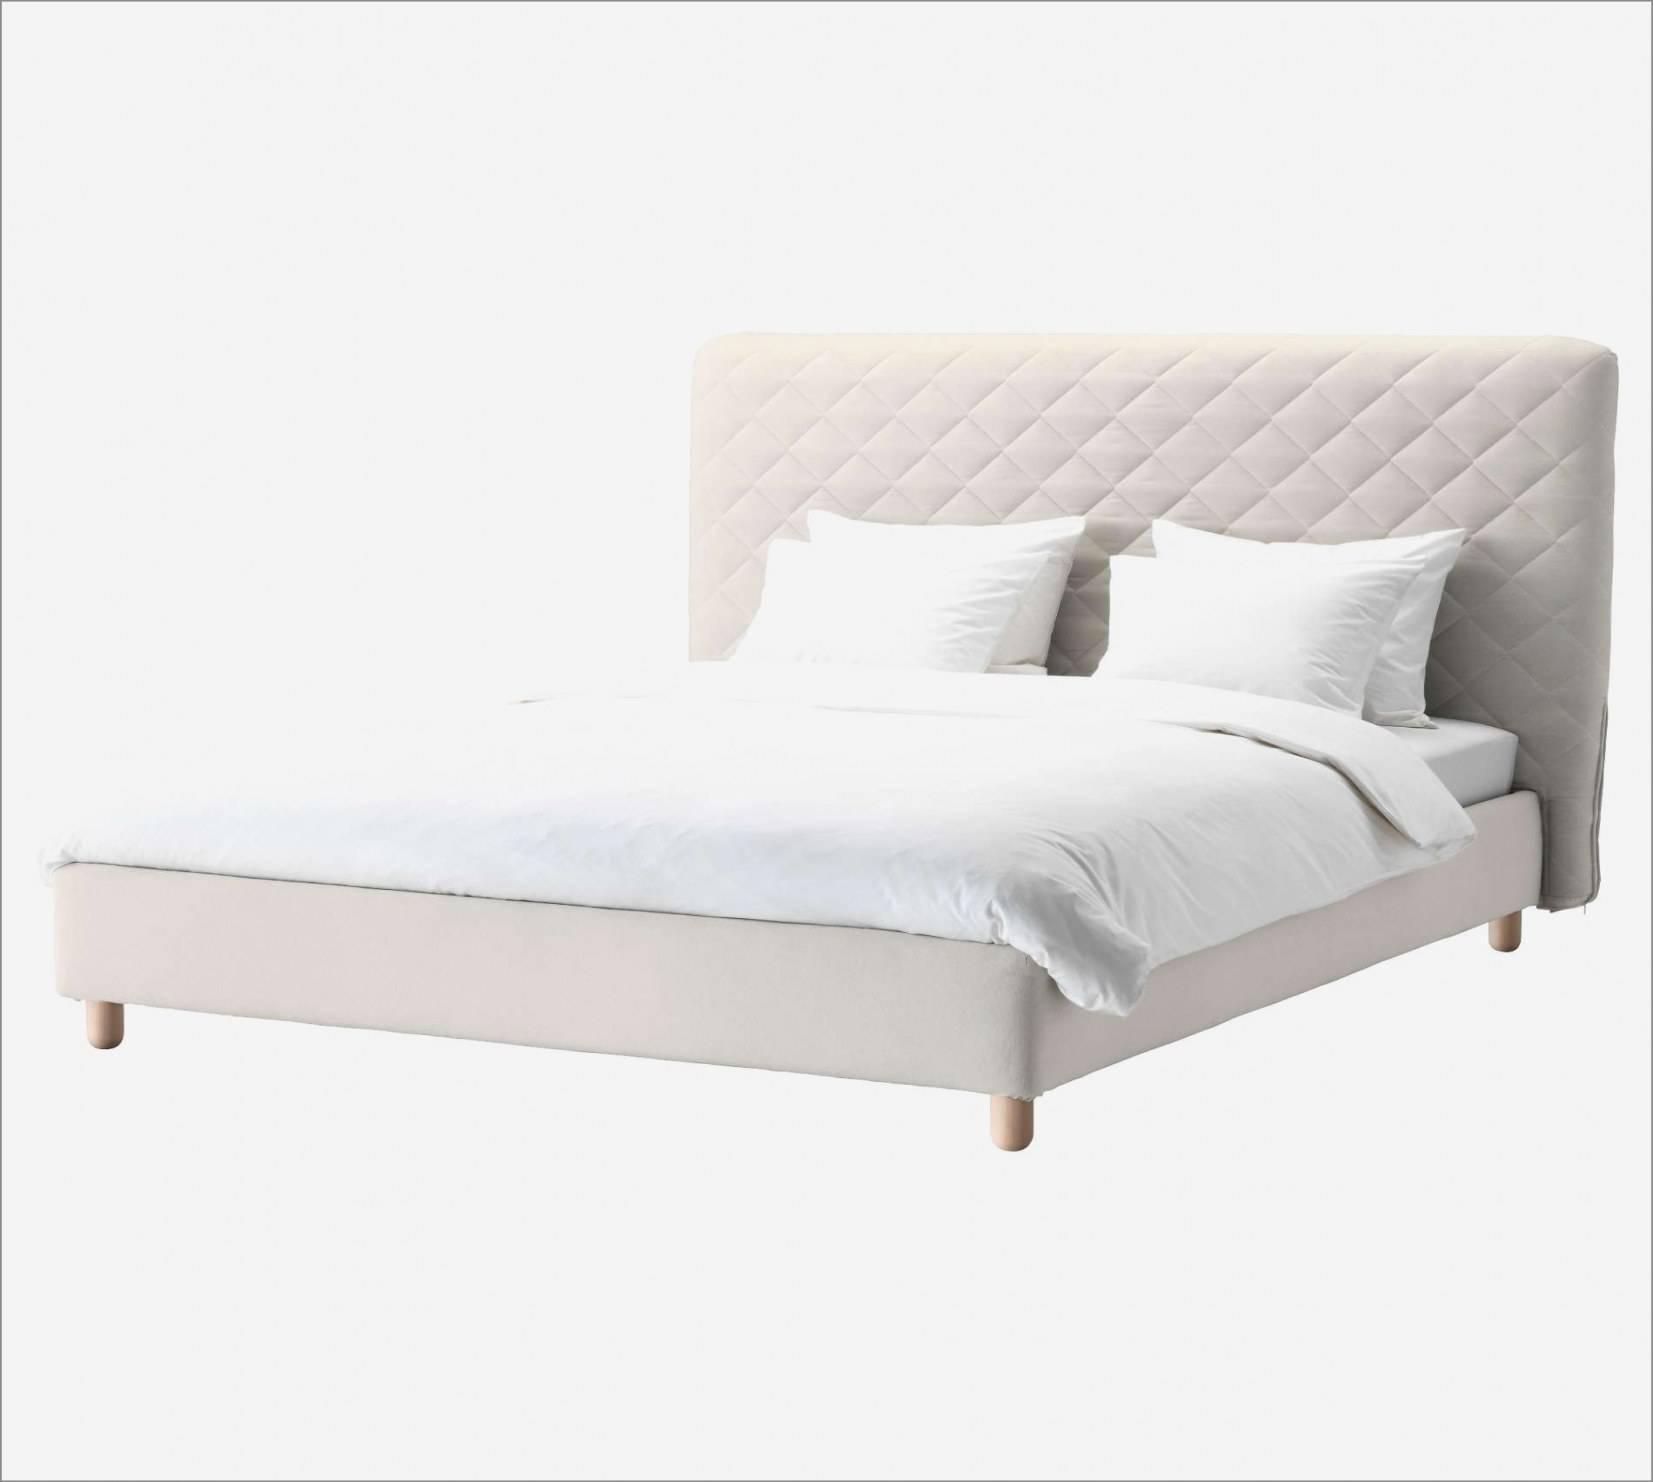 bedroom ideas ikea king bedroom sets cheap omnilise of bedroom ideas ikea